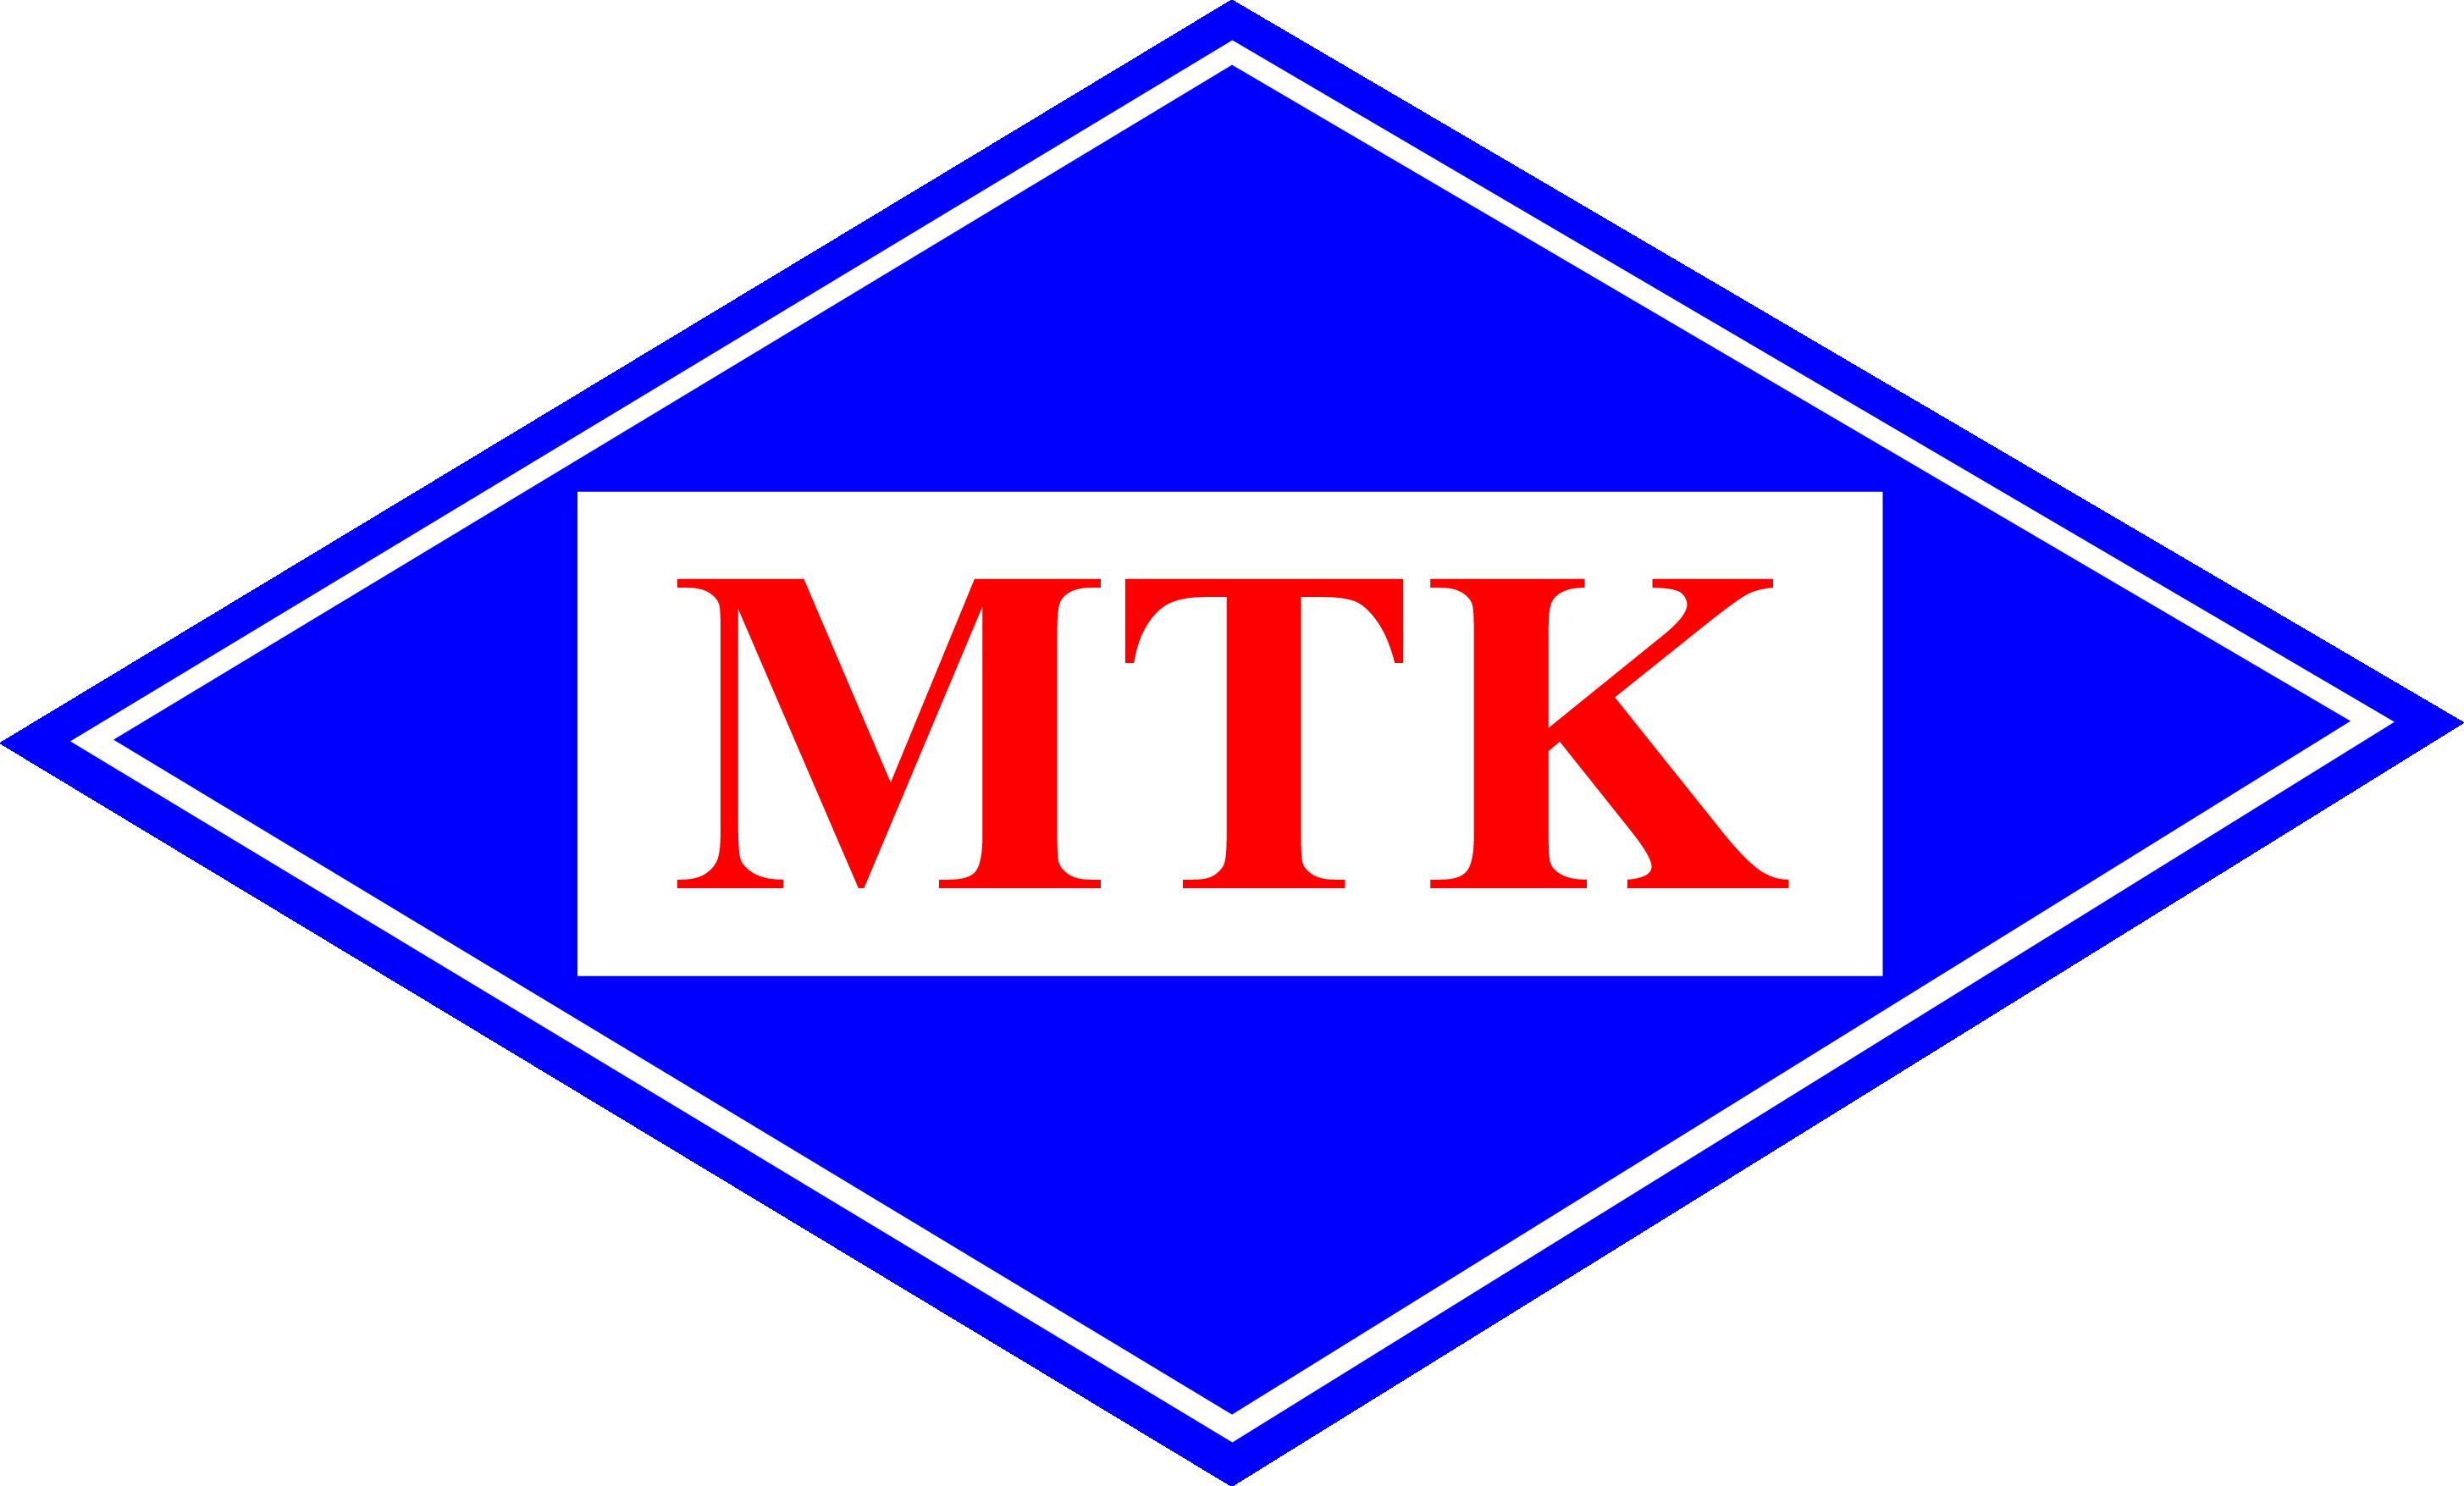 M.T.K. WOOD